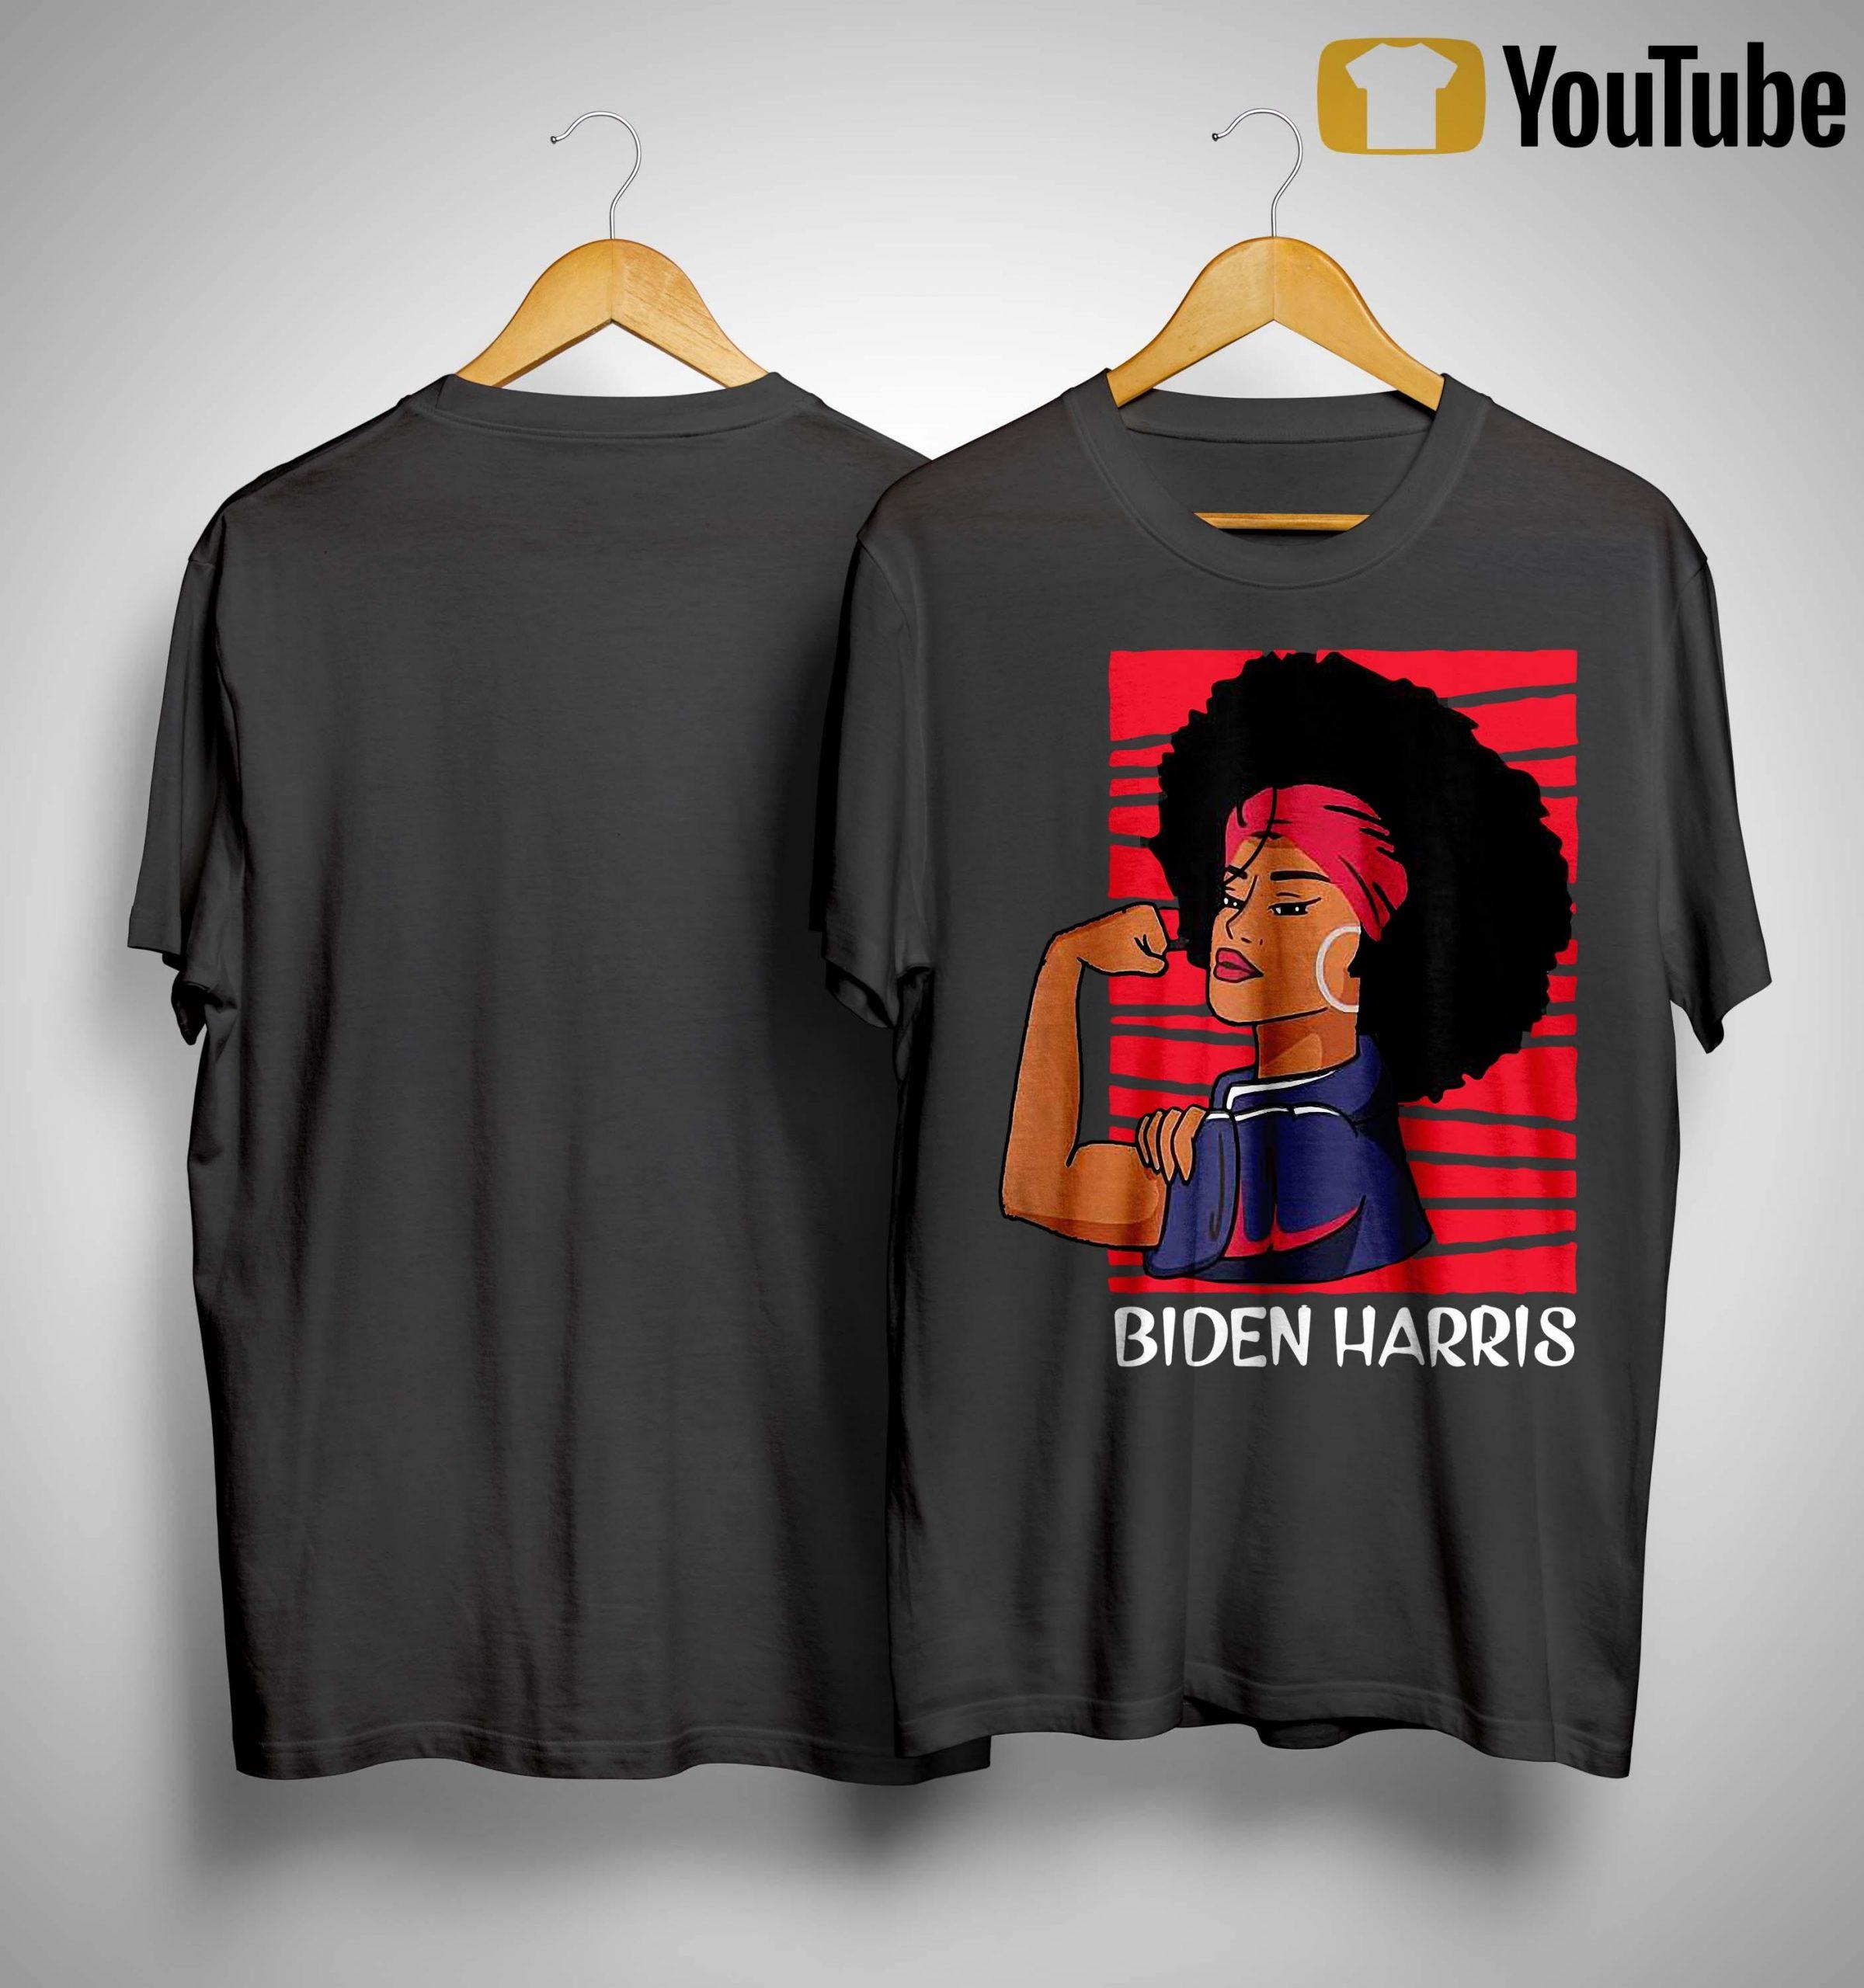 Biden Harris 2020 Black Afro Women In Rosie Riveter Shirt